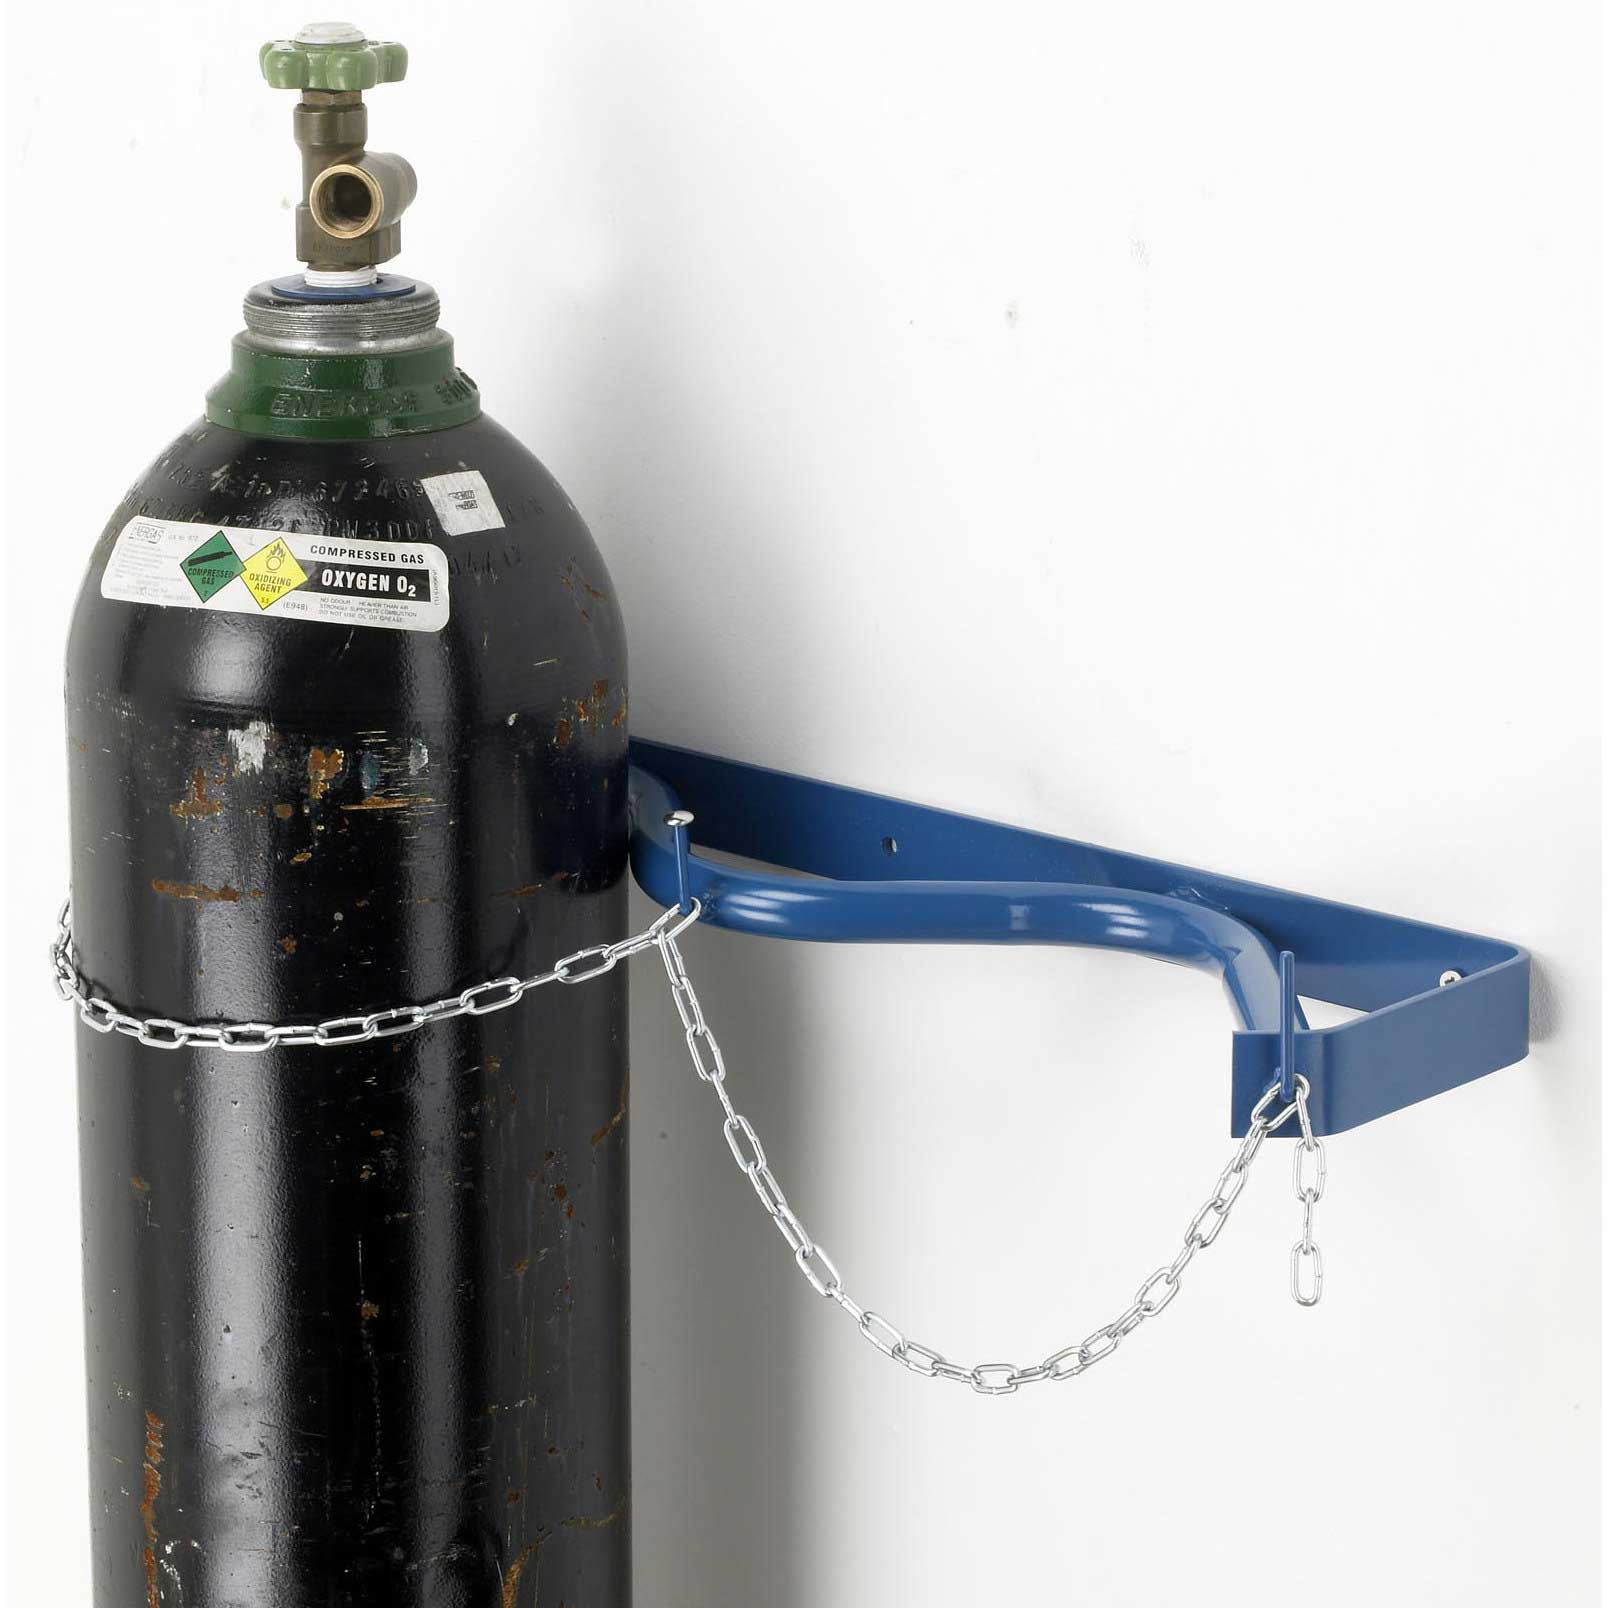 Wall Bracket To Hold 2 Gas Cylinders Upto 280mm Dia Cwb 2w